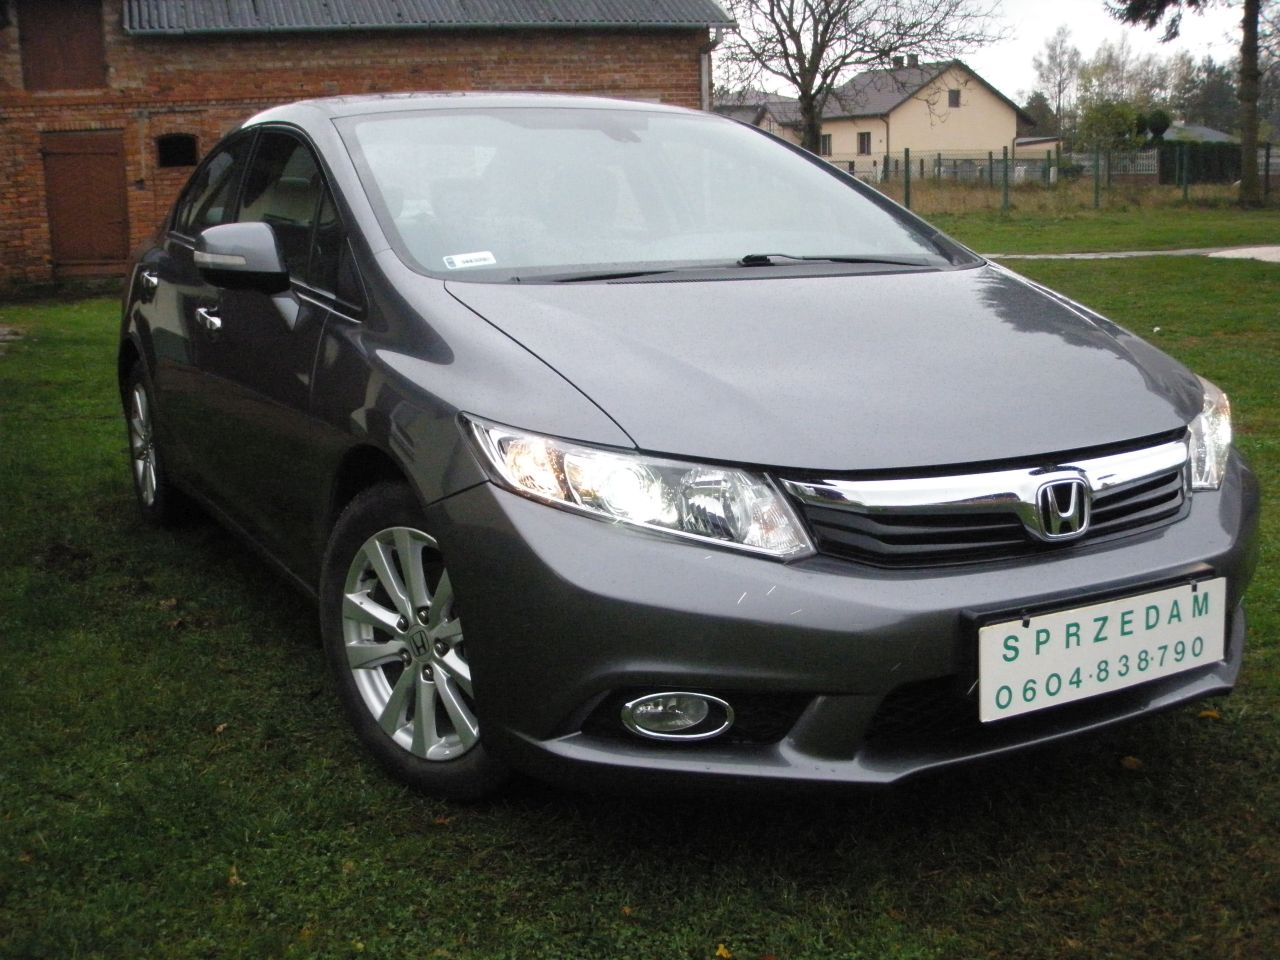 Honda Civic Ix Sedan Salon Polska Dvd Polecam 7021720738 Oficjalne Archiwum Allegro